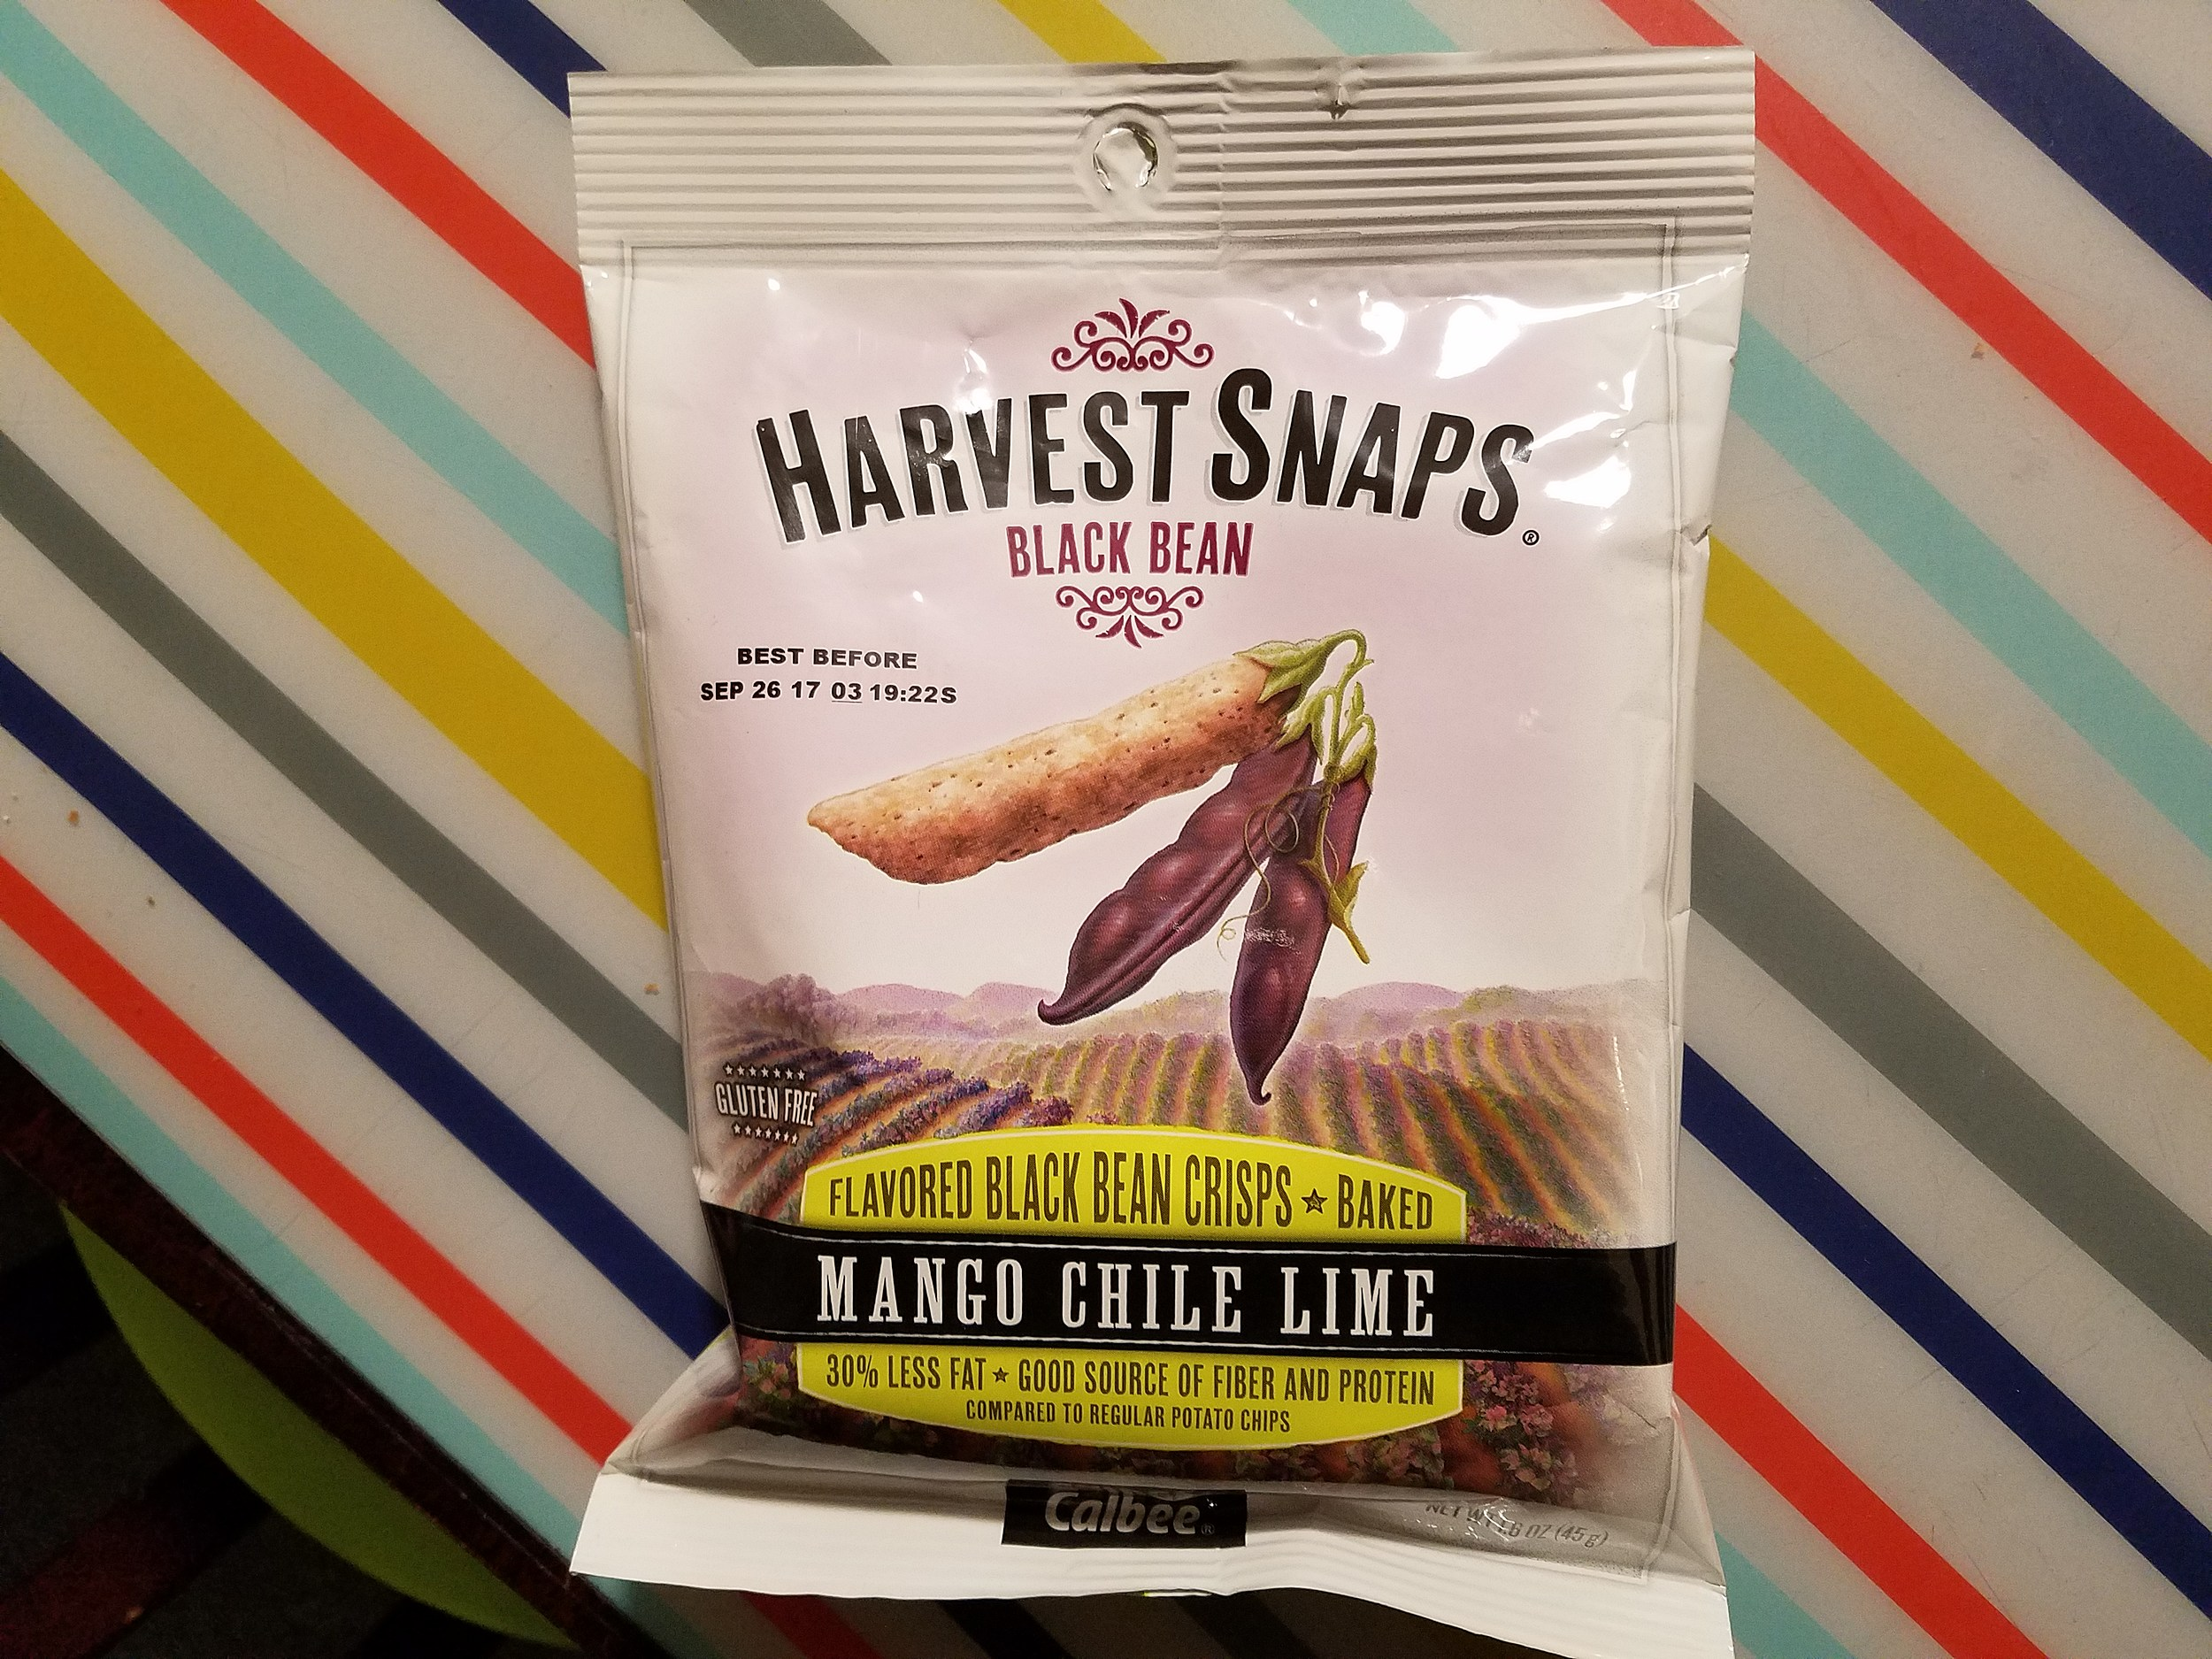 Mango Chili Harvest Snaps